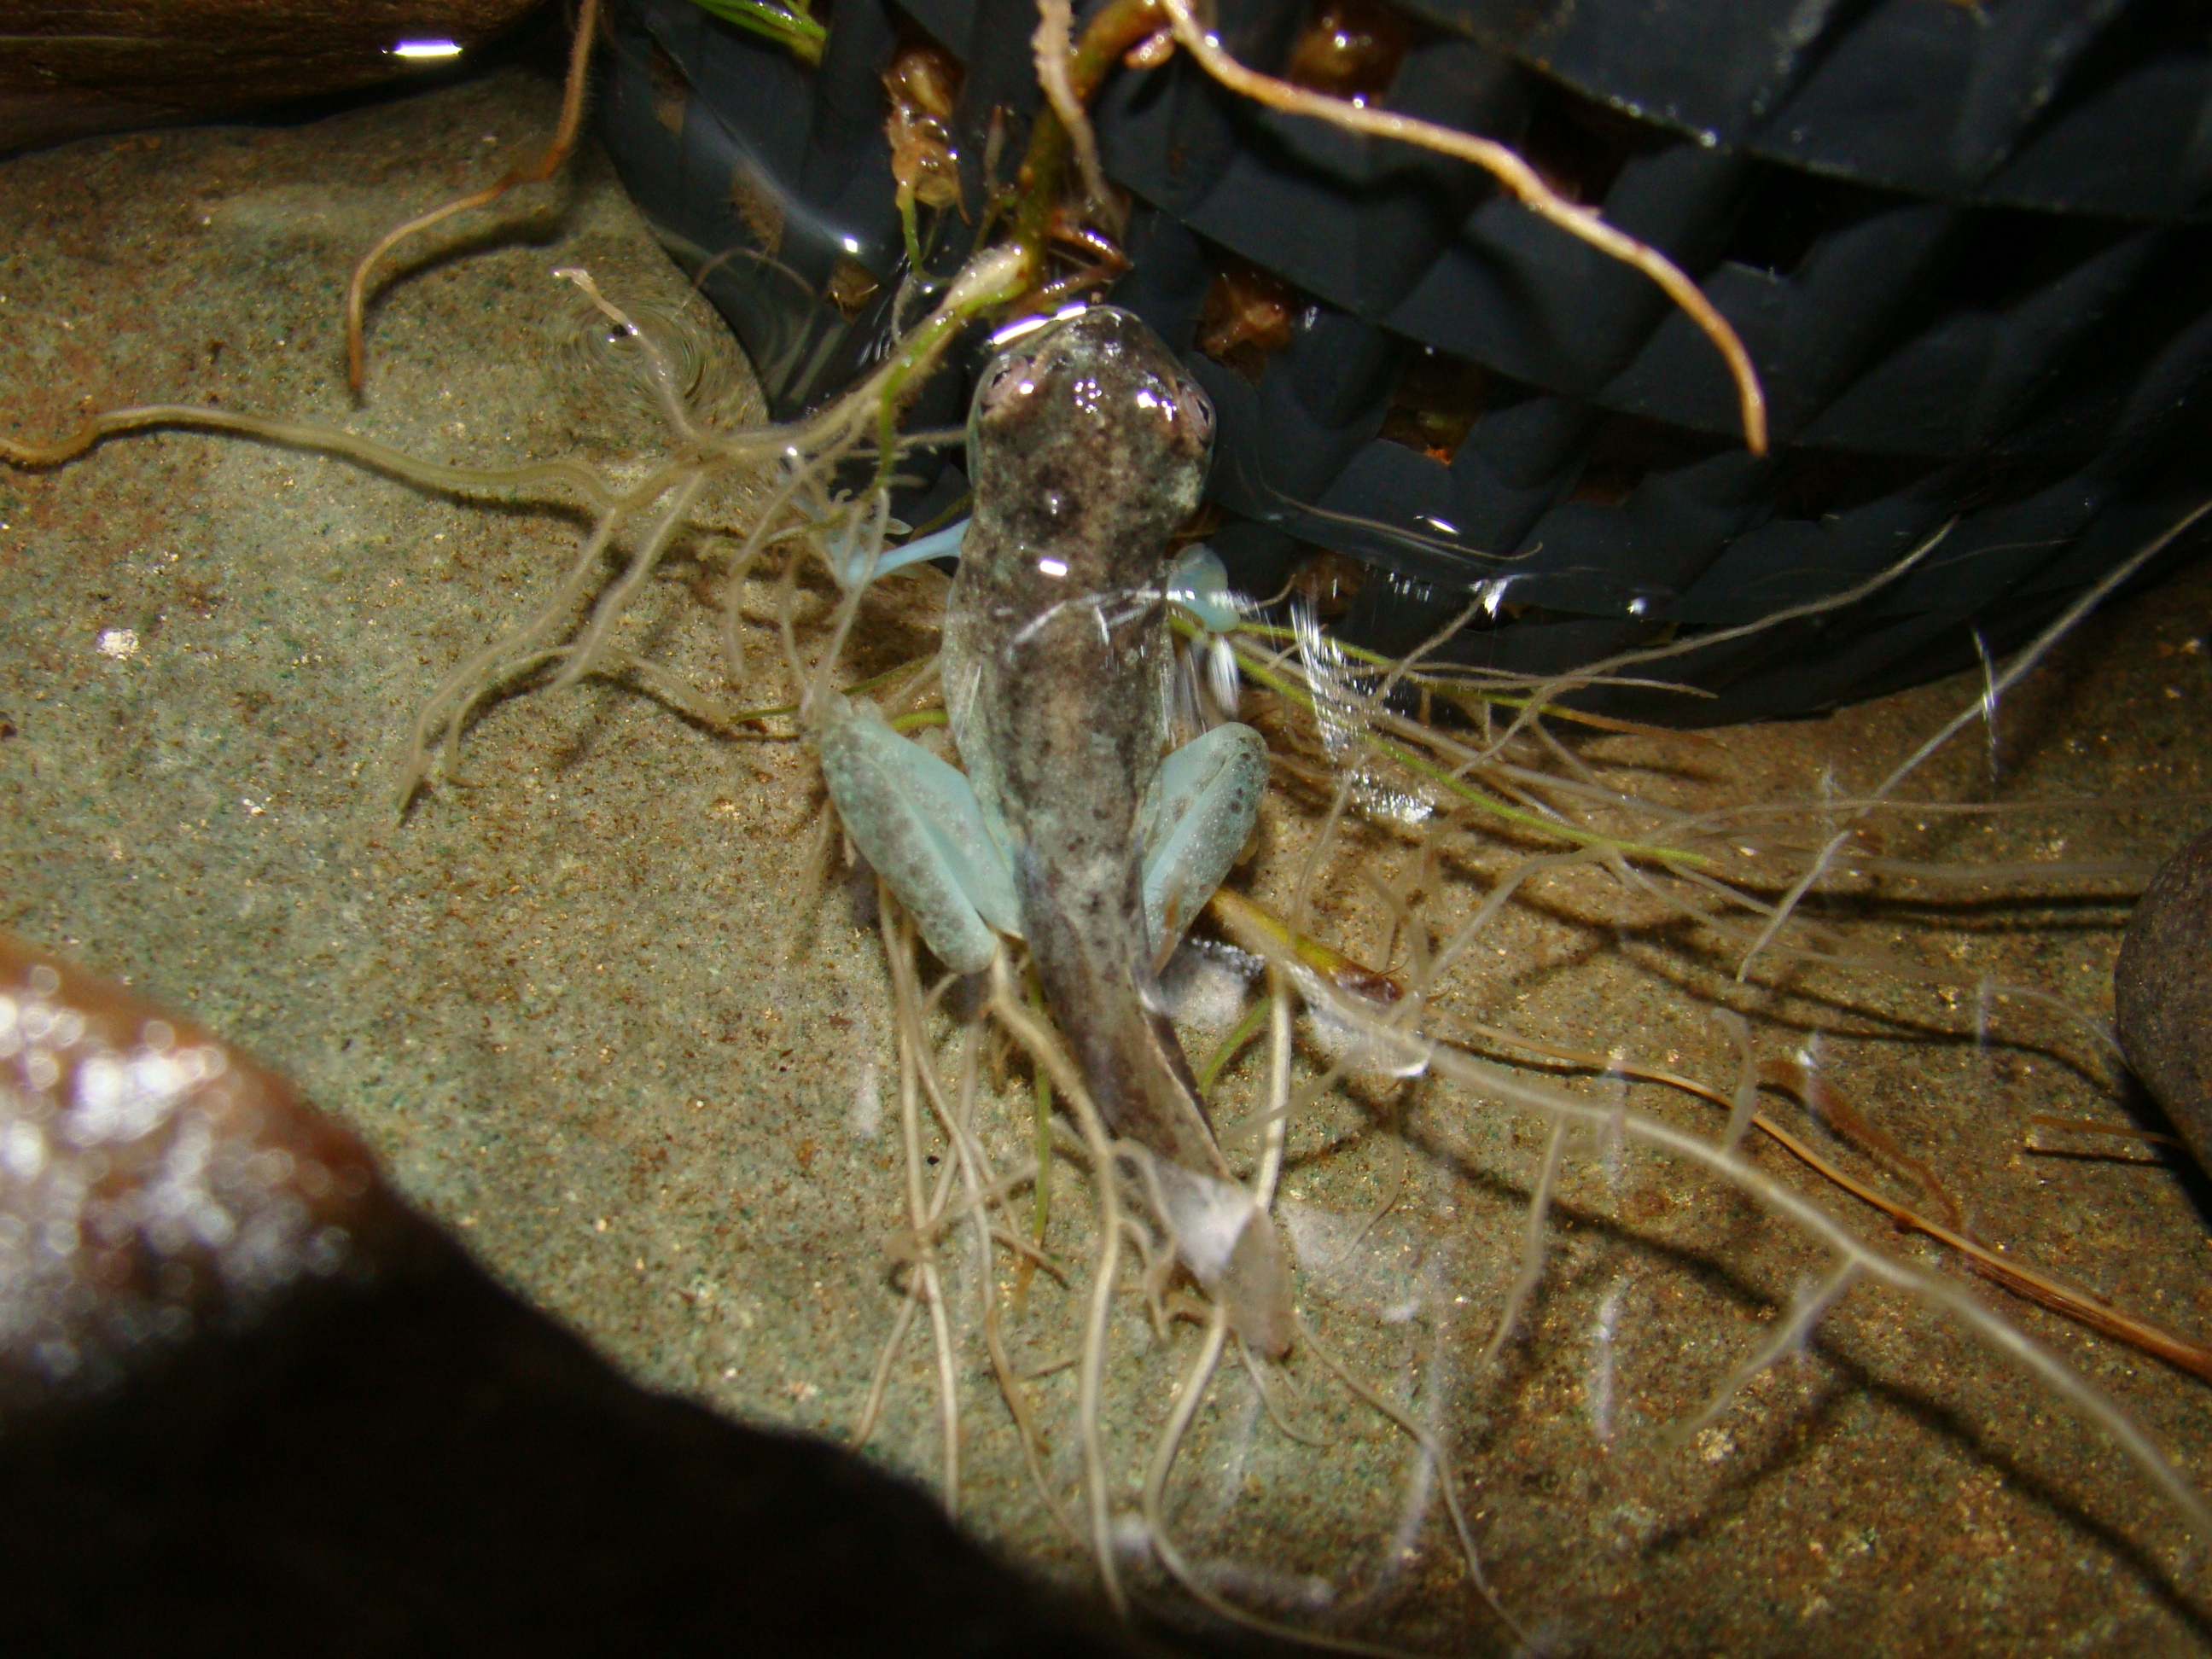 La loma tree frog morph